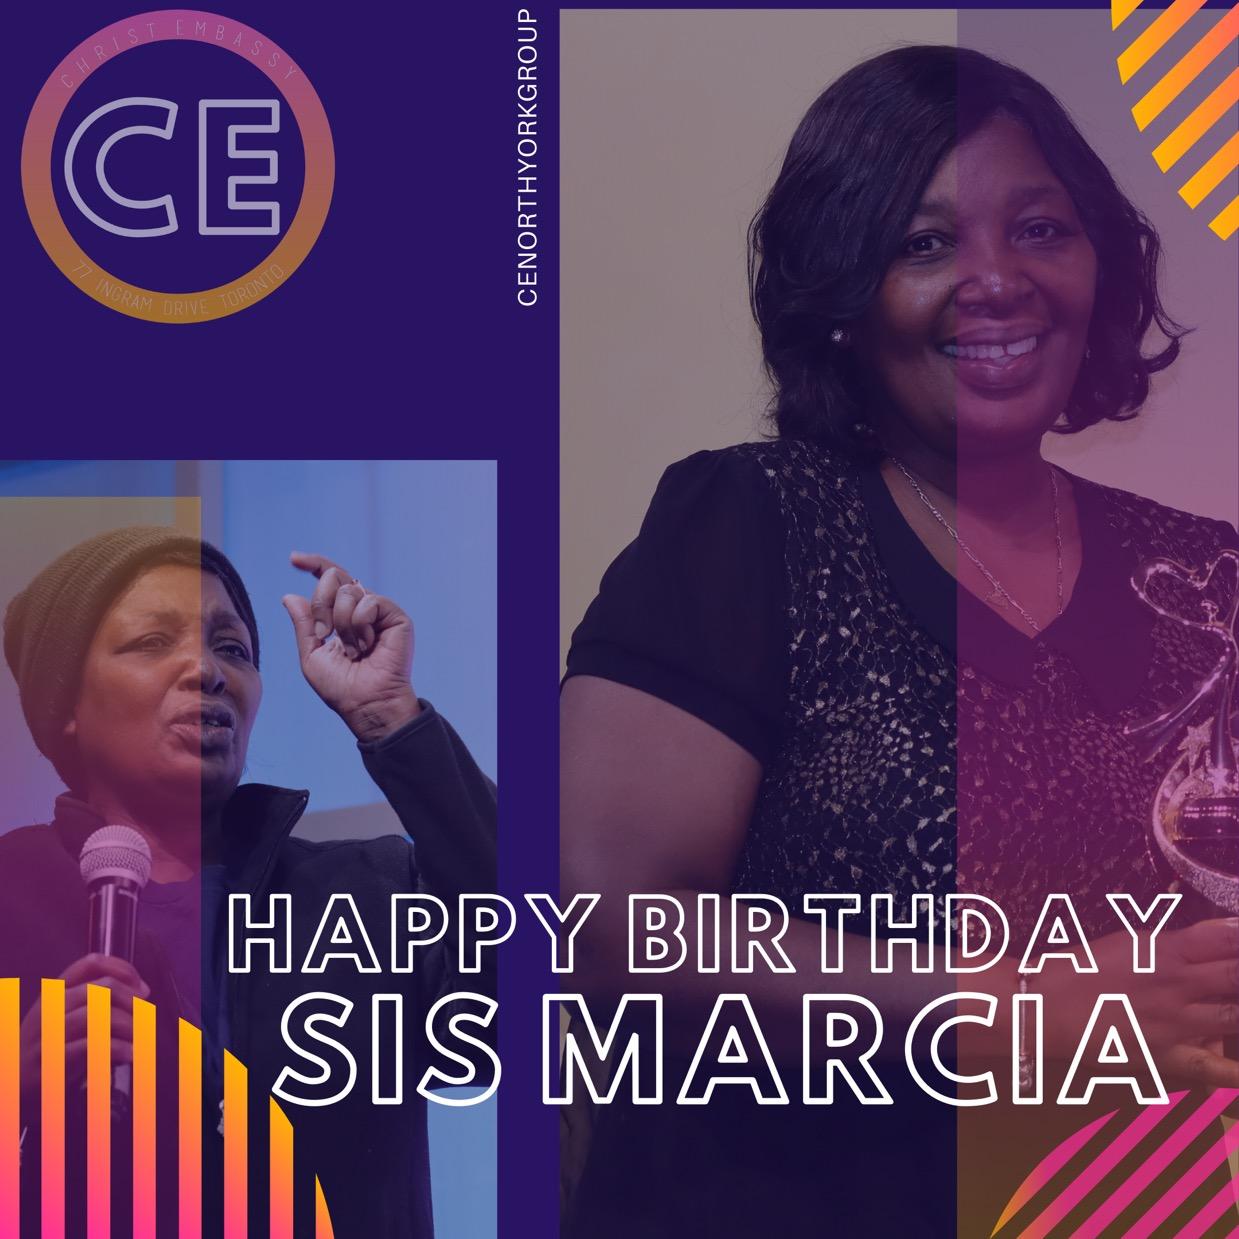 Happy Birthday Dearest Sis Marcia.